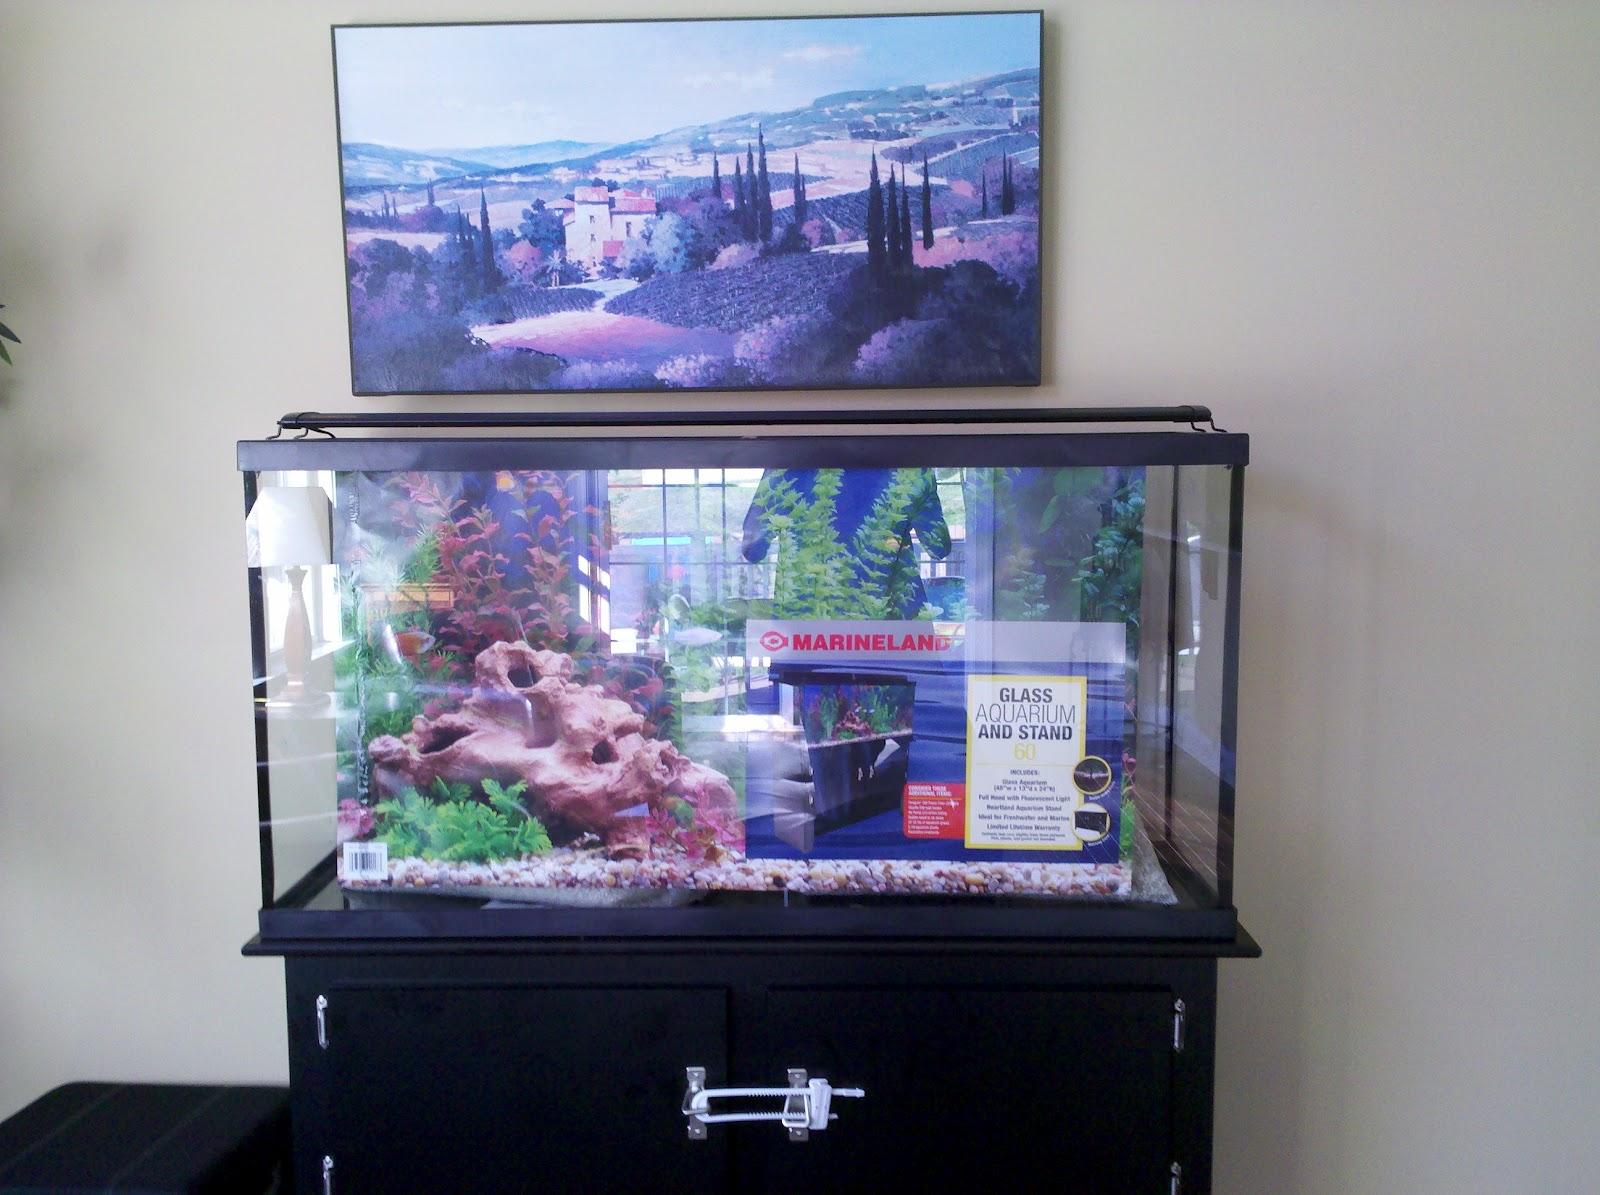 Fish tank maintenance 60 gallon offerup 60 gallon fish for 60 gallon fish tank